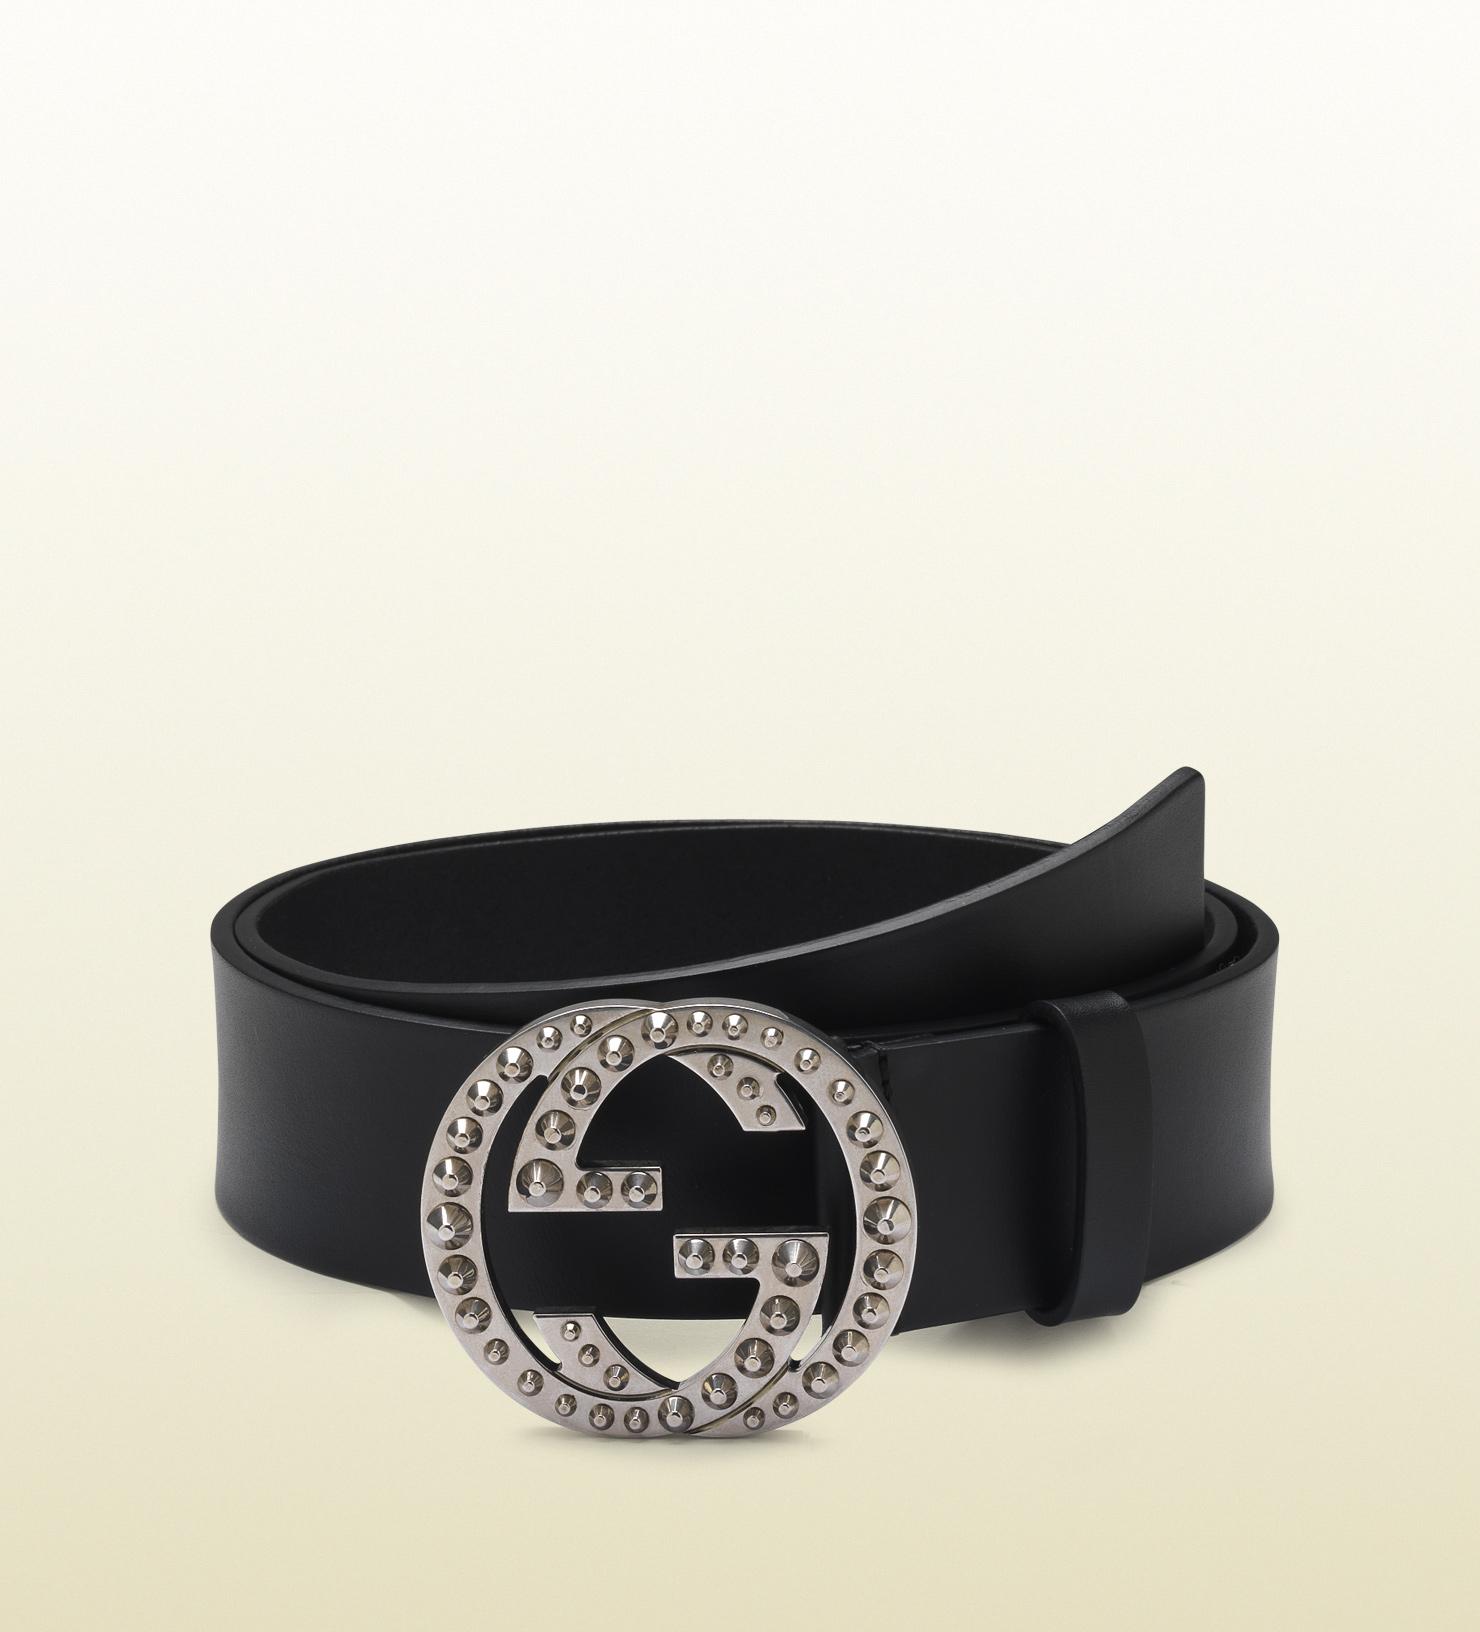 2642deb0712 Lyst - Gucci Black Leather Belt with Studded Interlocking G Buckle ...